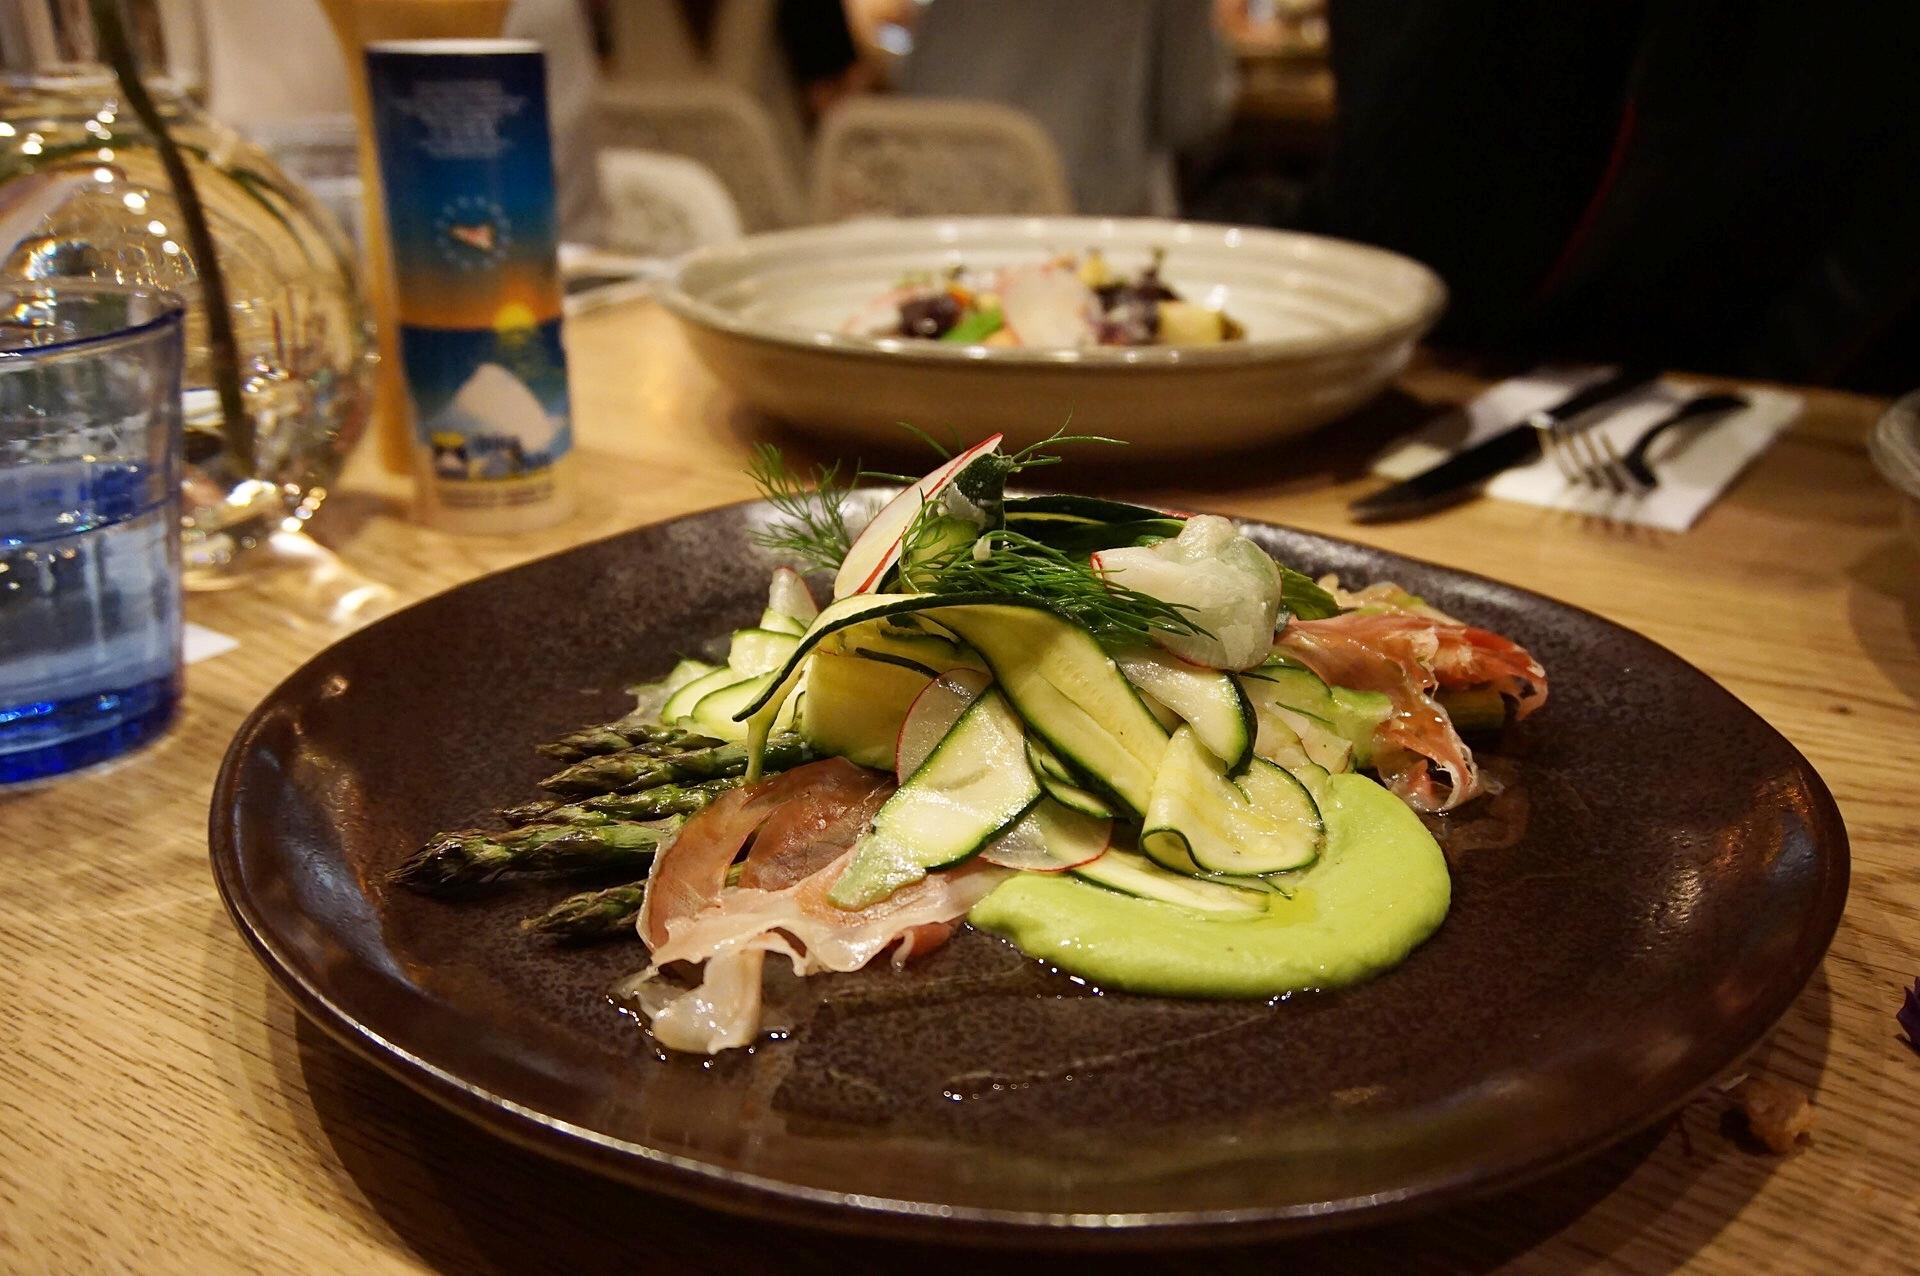 Torbay asparagus, green pea puree, Prosciutto di Parma, courgette, dill, radish, shaved parmesan salad (gf)